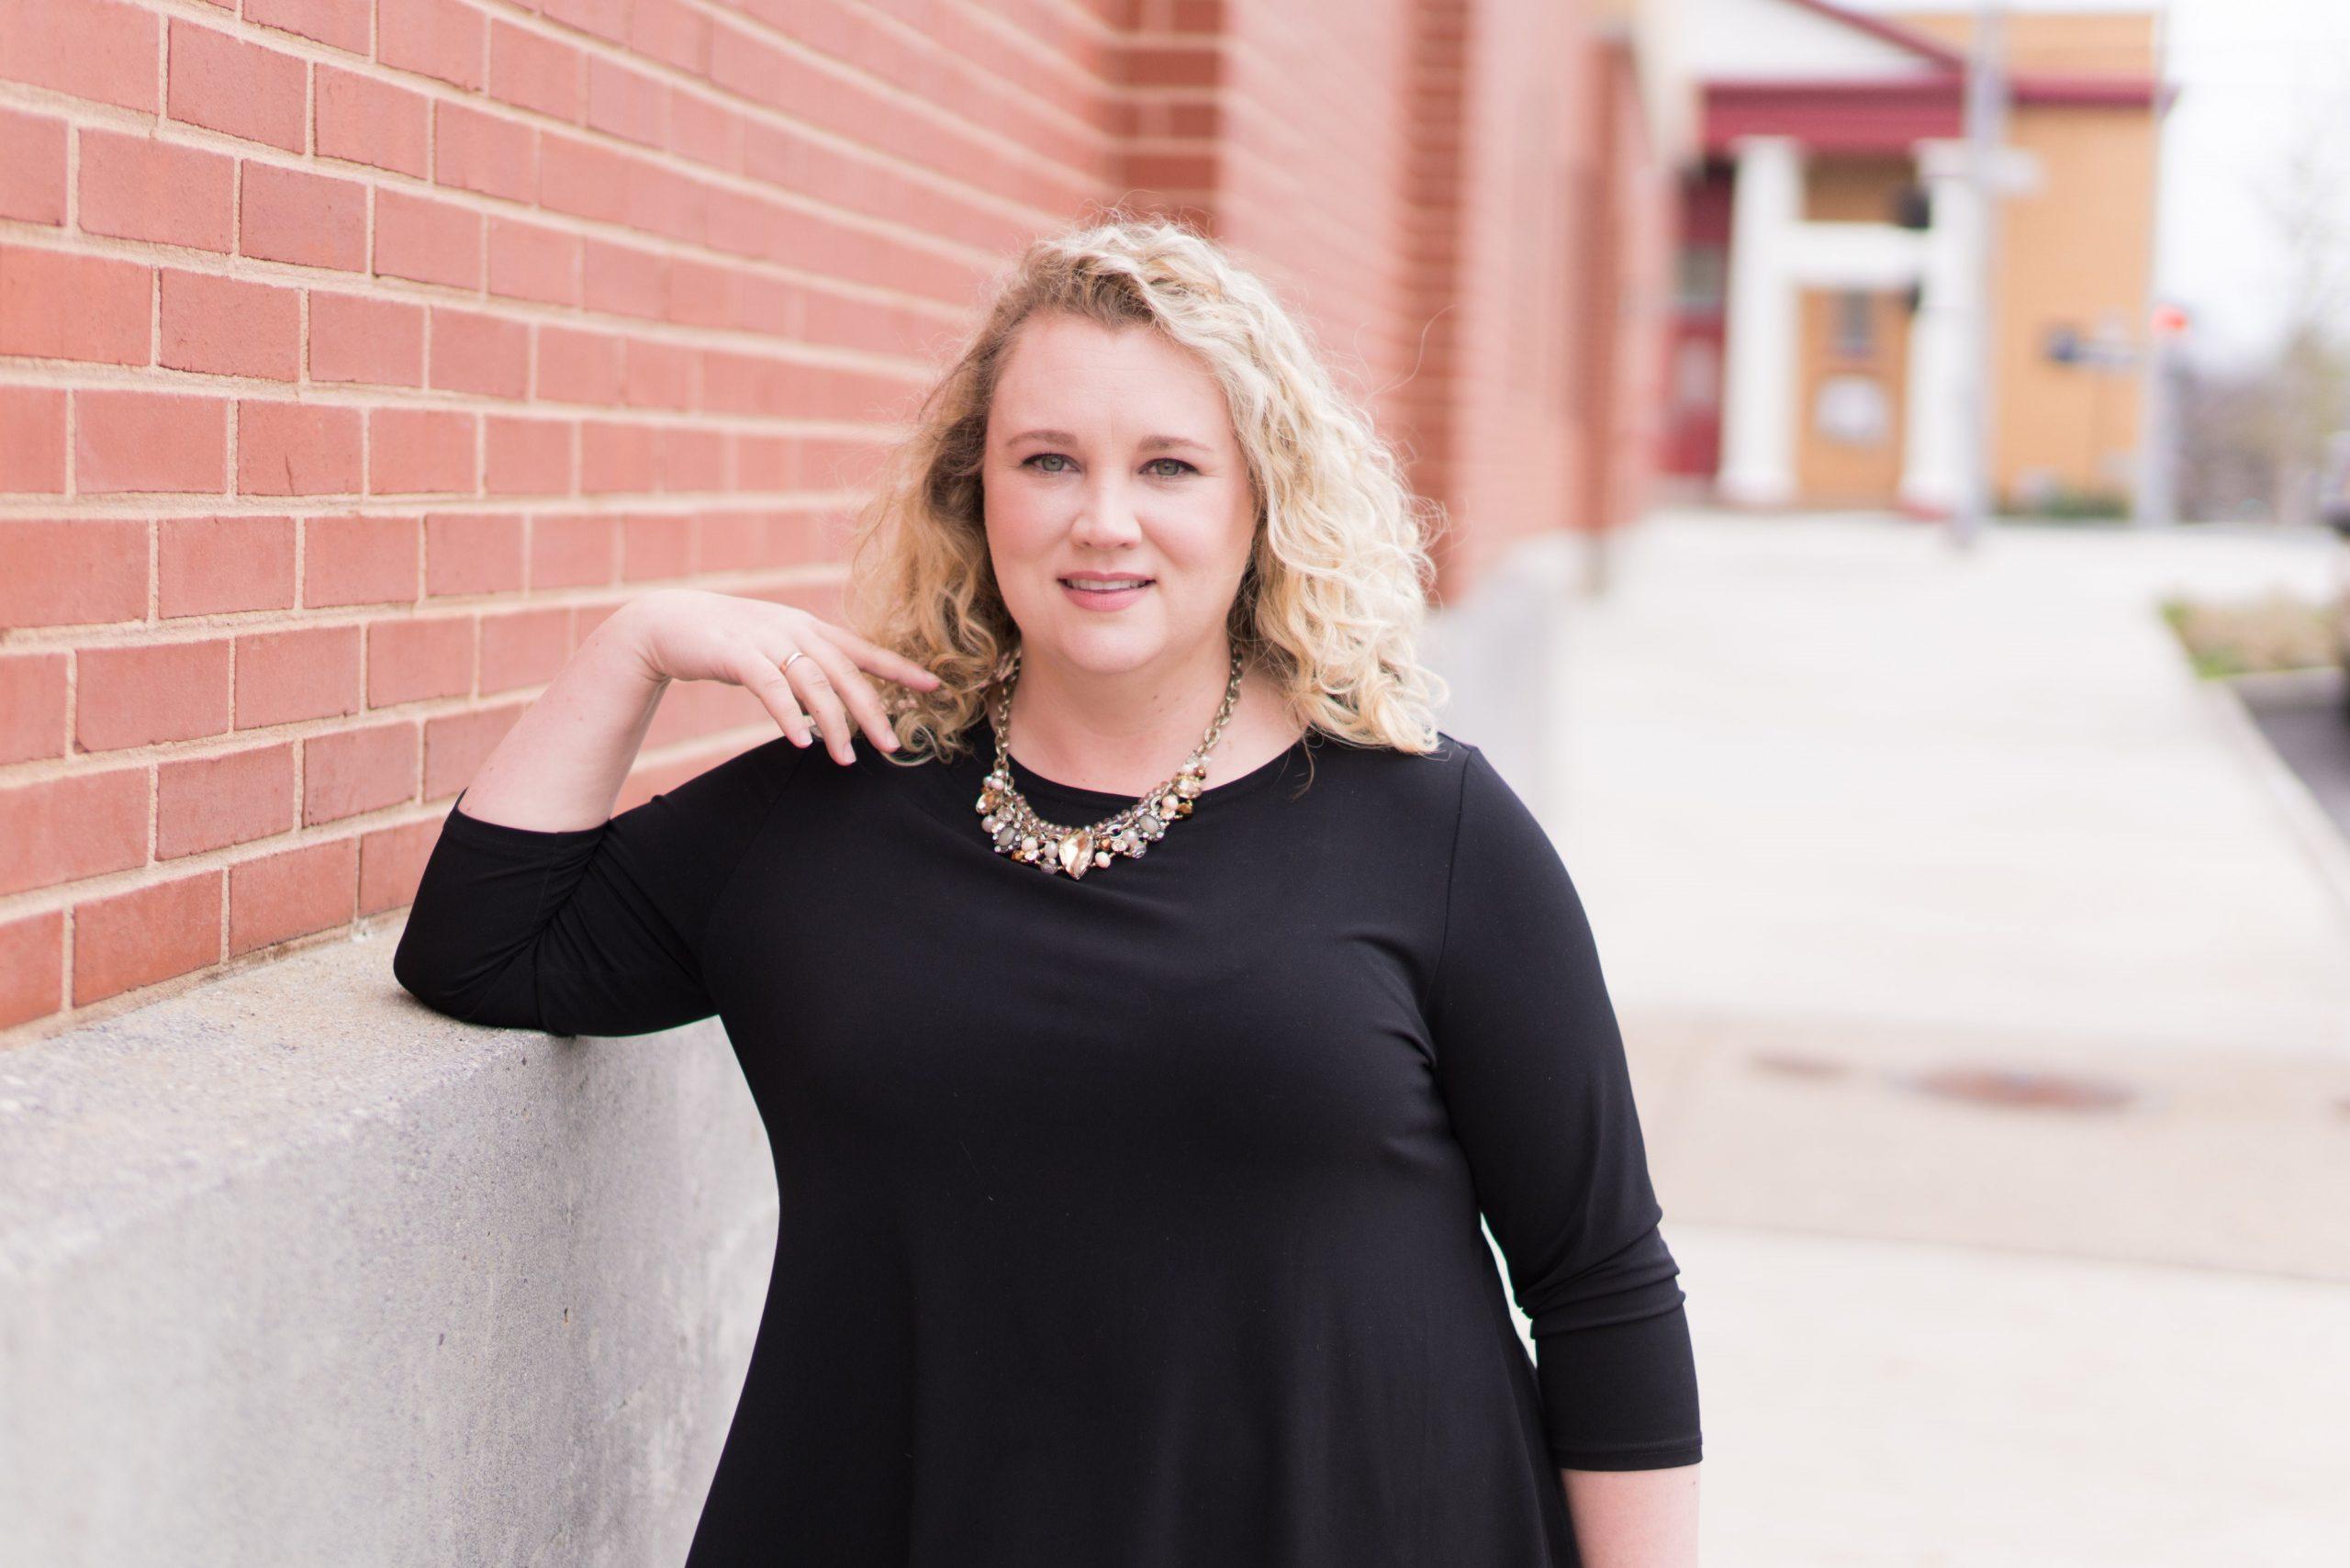 <strong>Alison Jorgensen, </strong><em>Vice President, Council of Community Services</em>